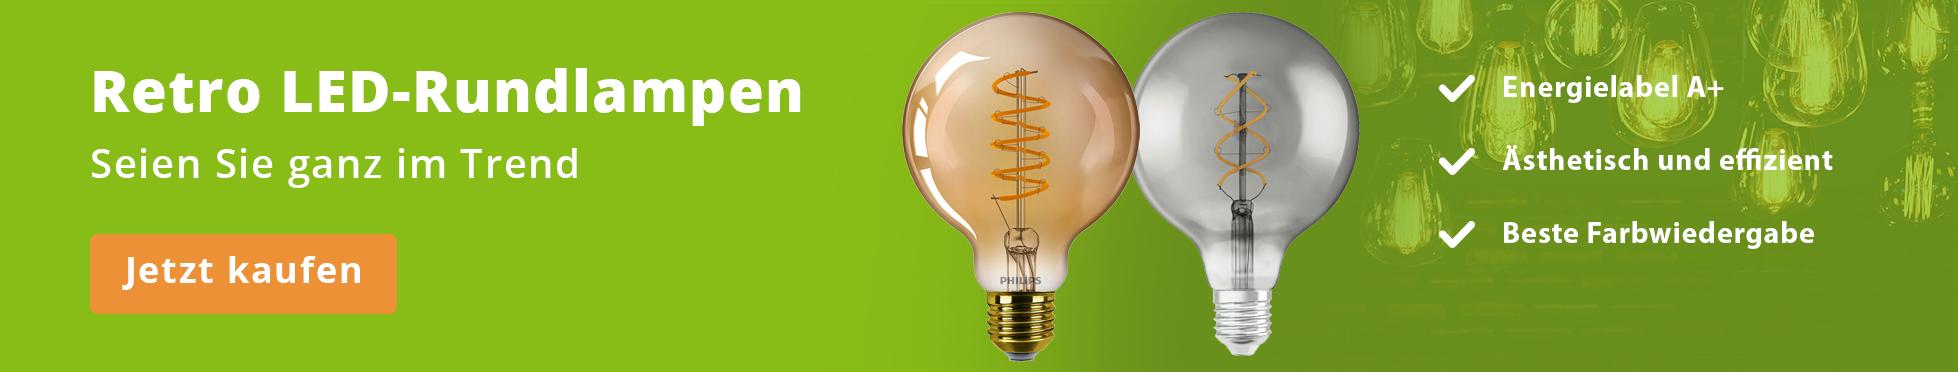 BL Retro LED bulbs DE B0123